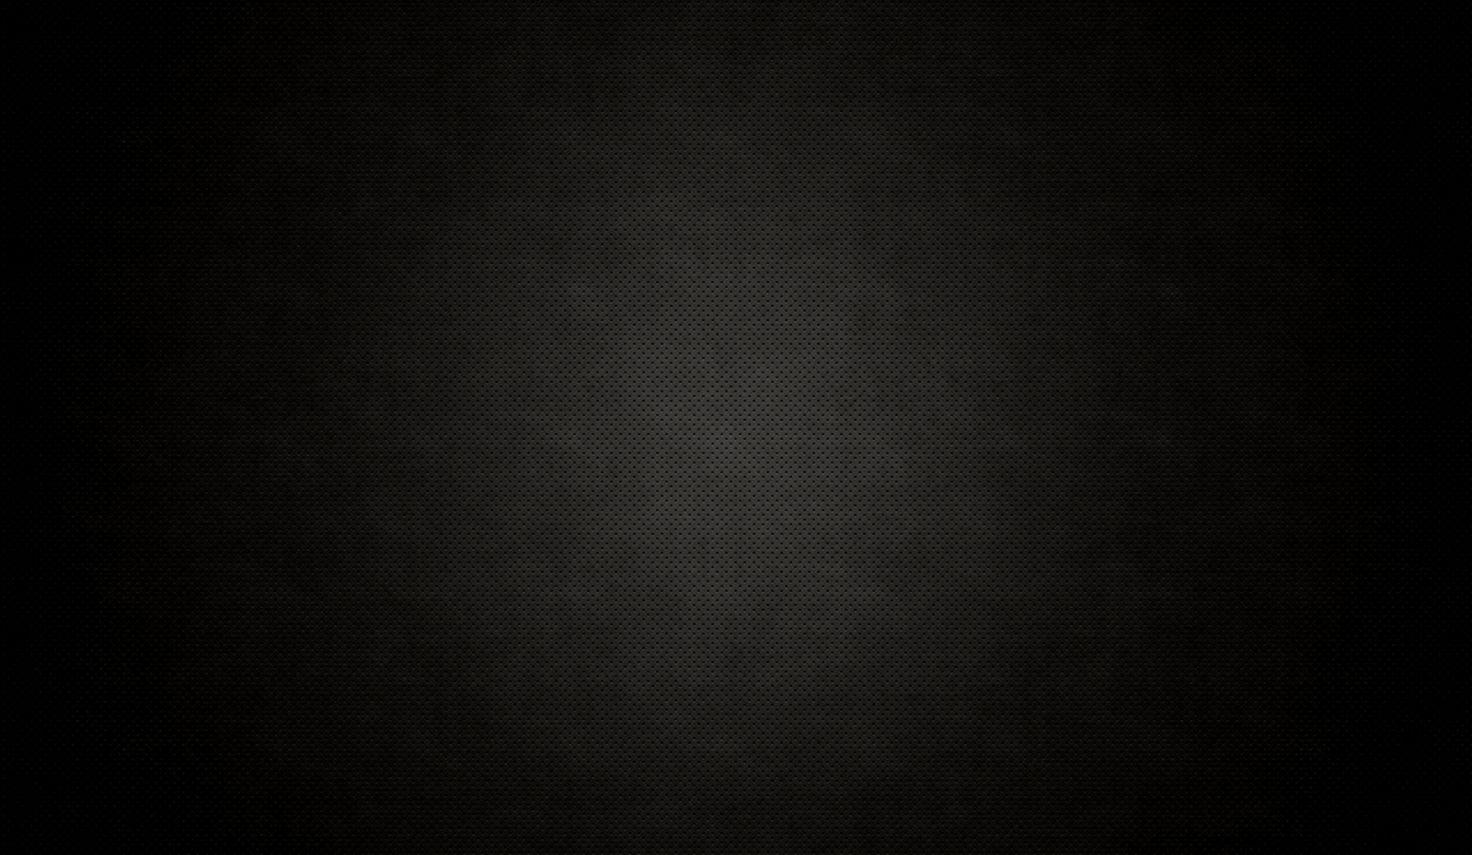 Black Wallpapers 1920x1080   Wallpaper Cave